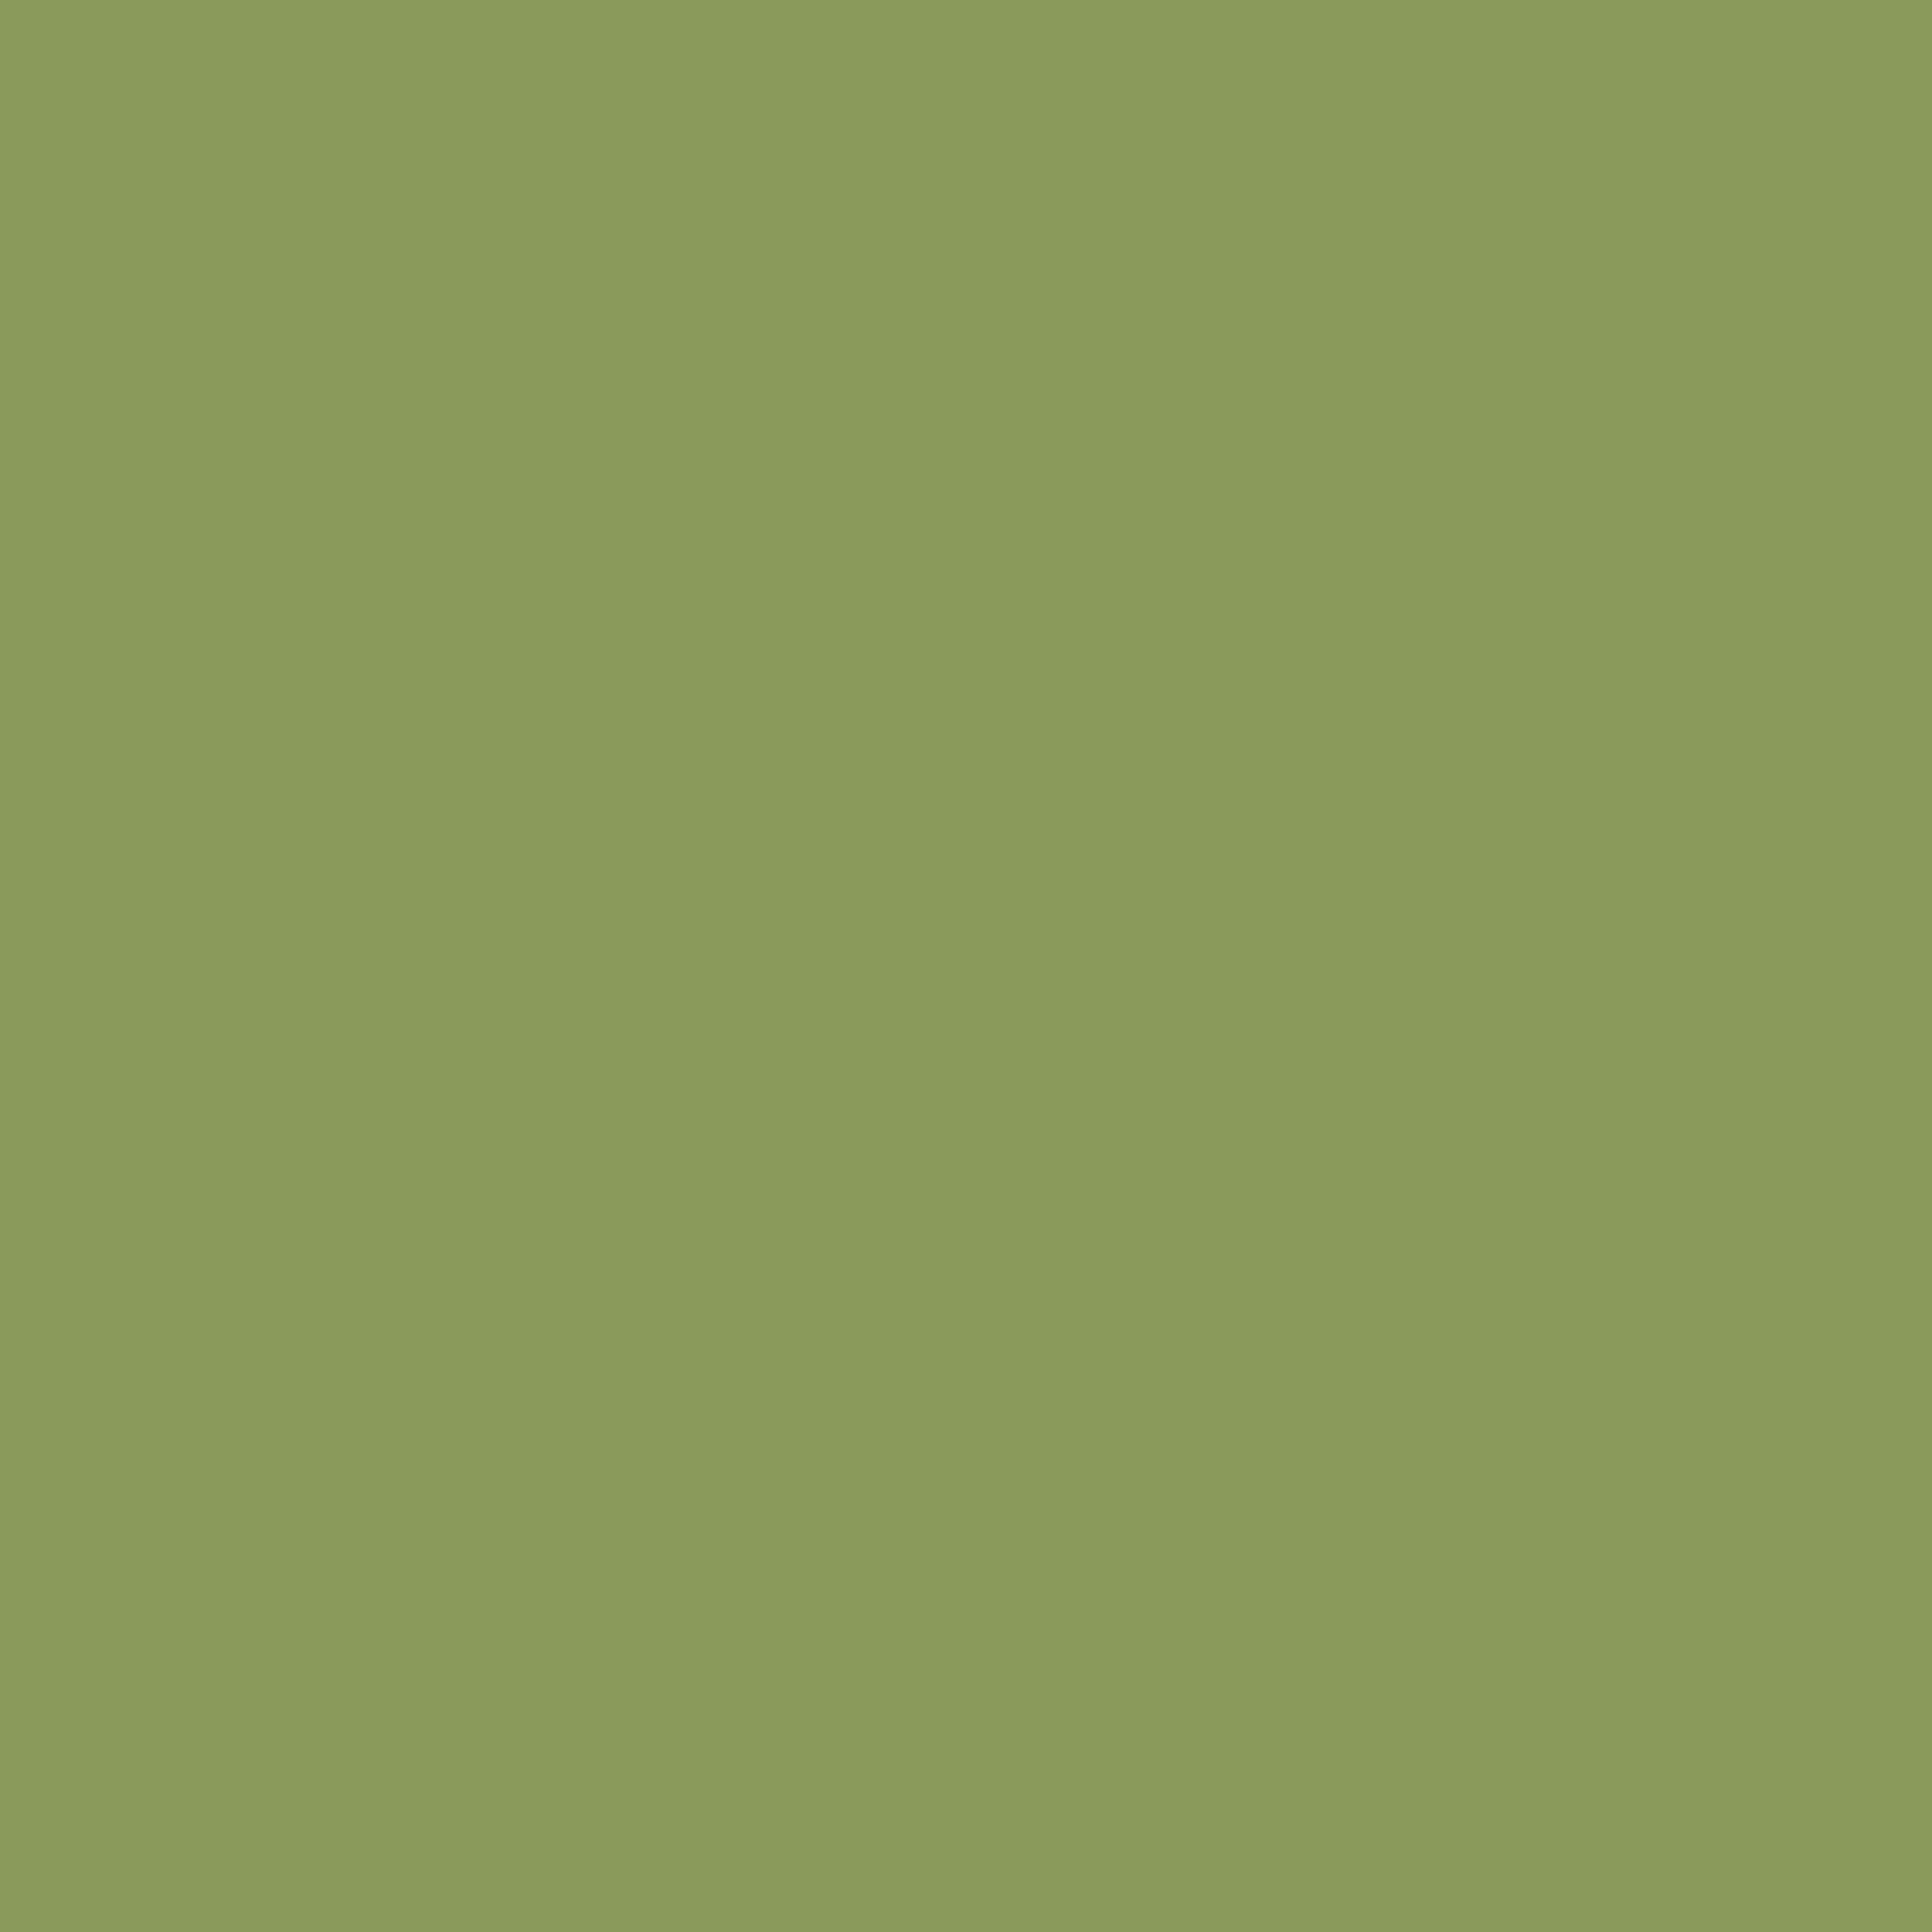 resolution dark moss green - photo #29